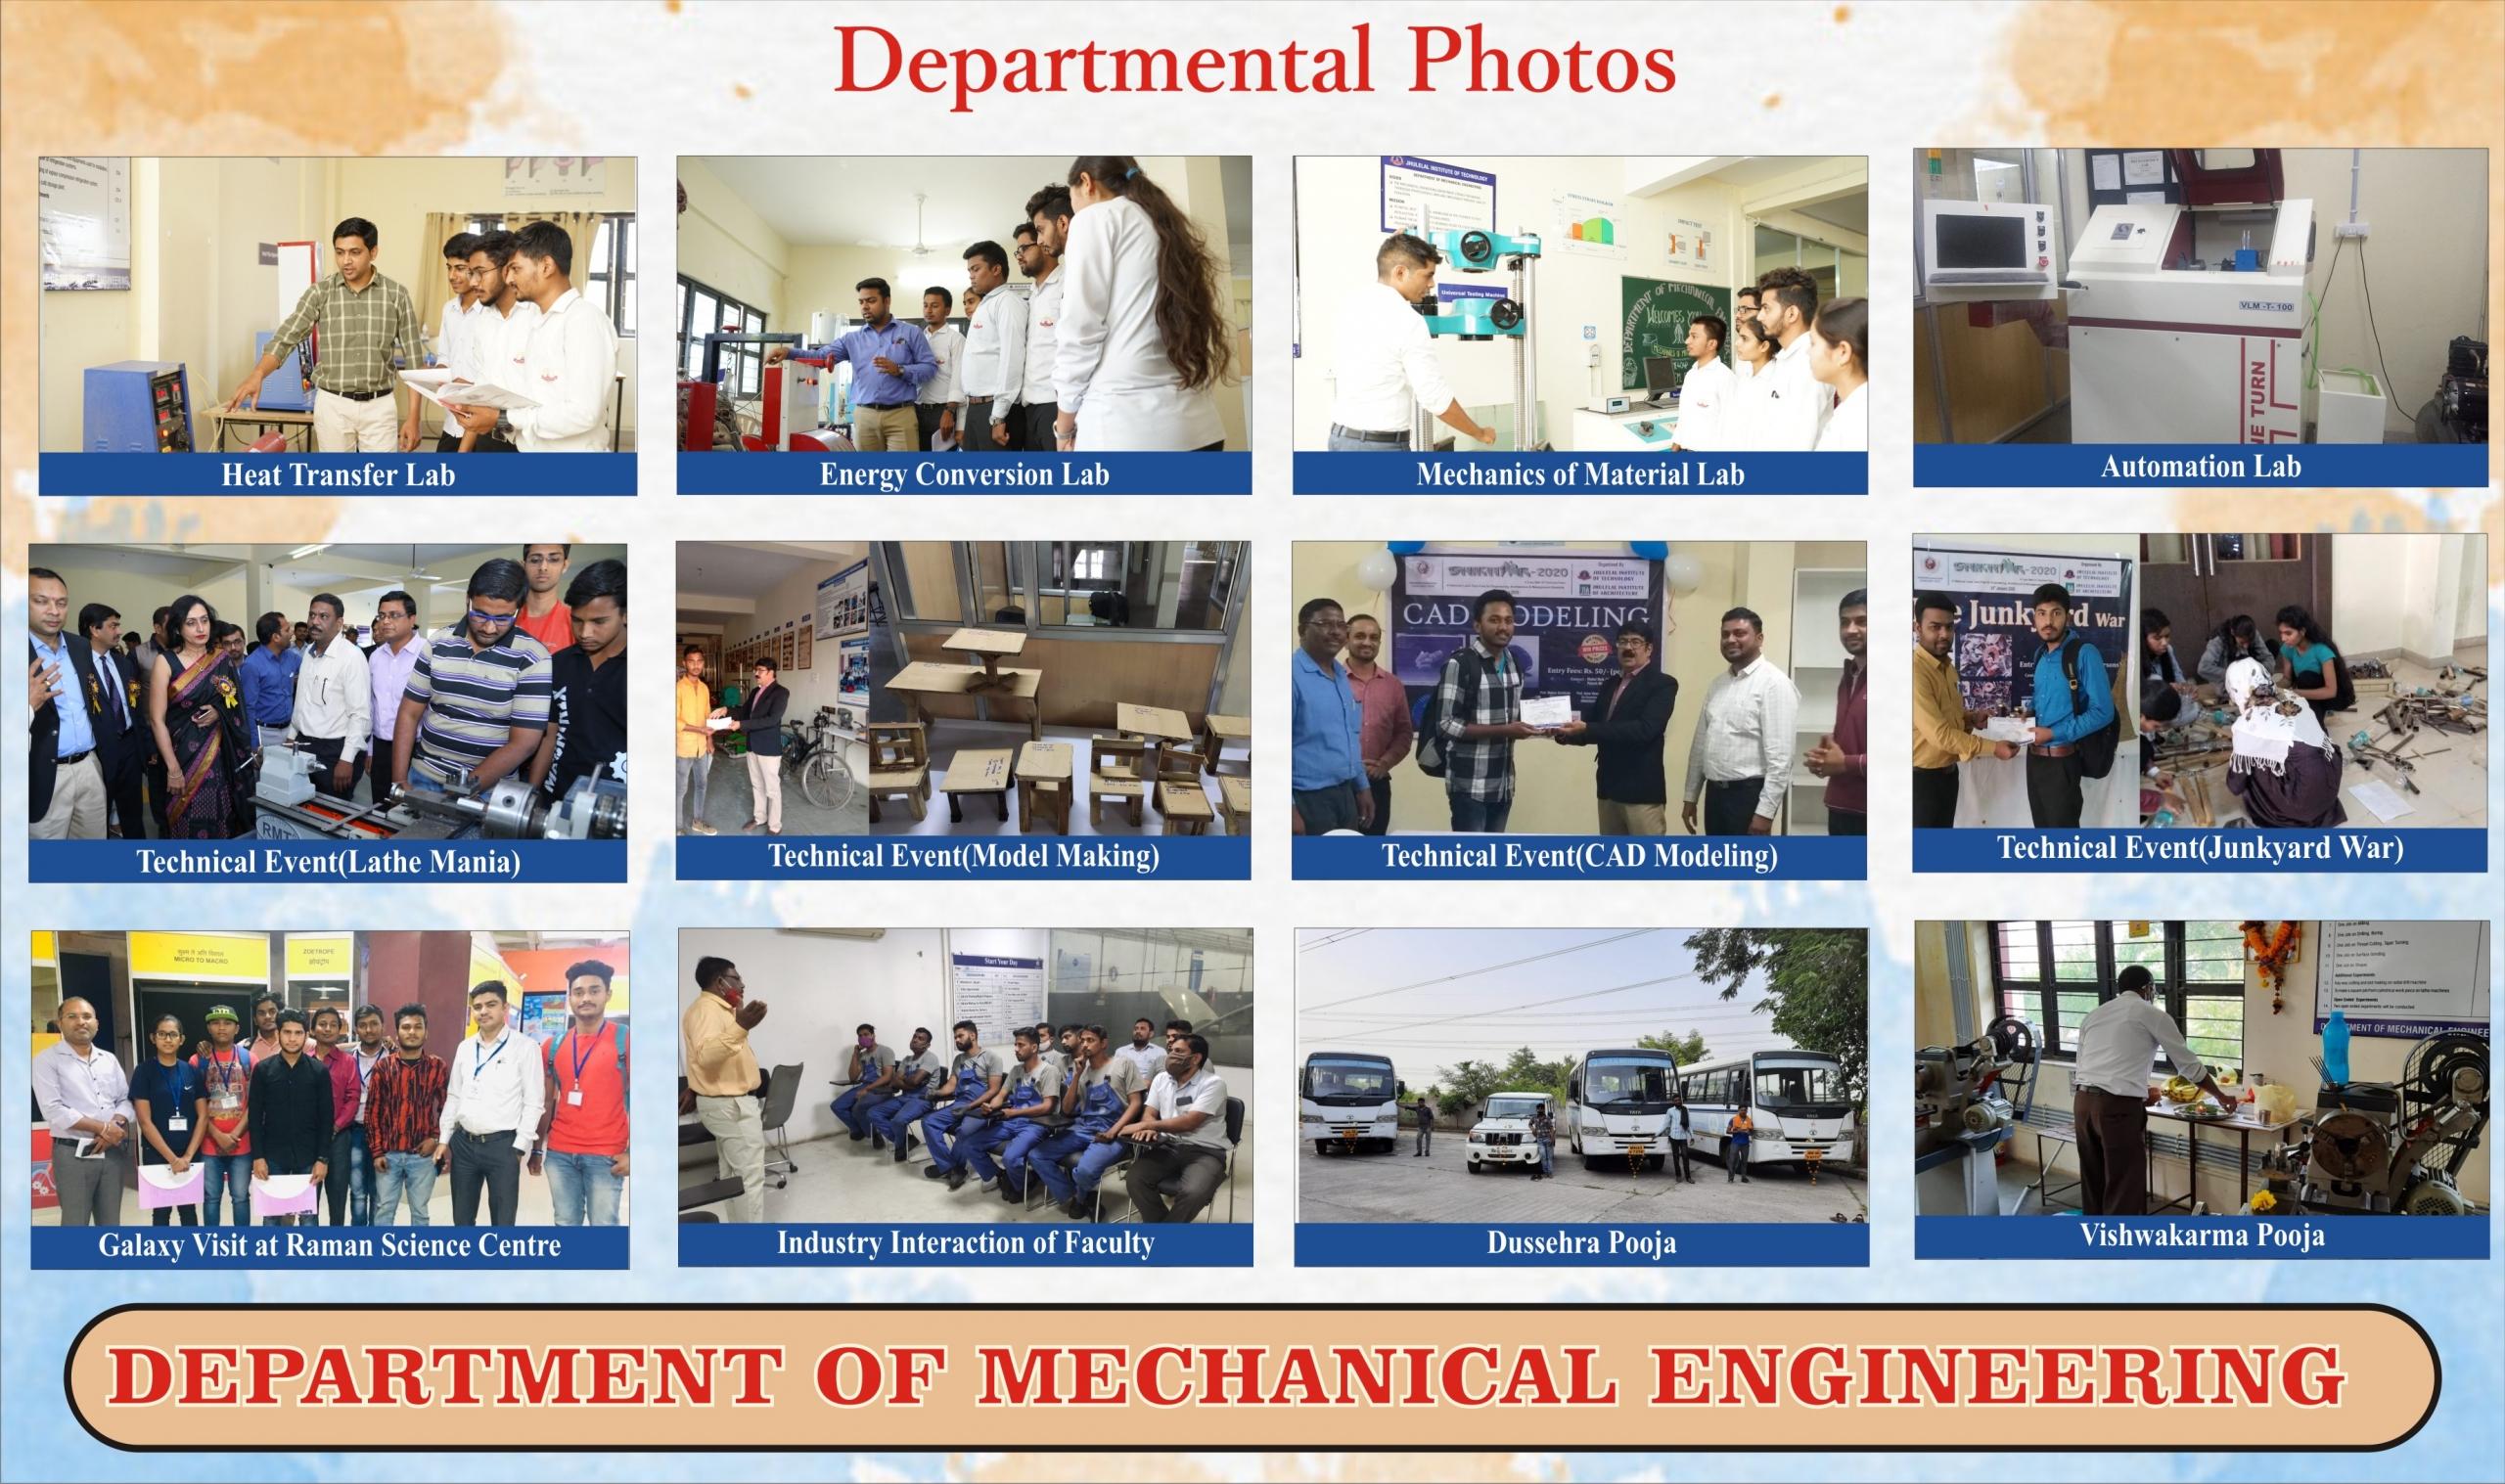 Departmental Photos